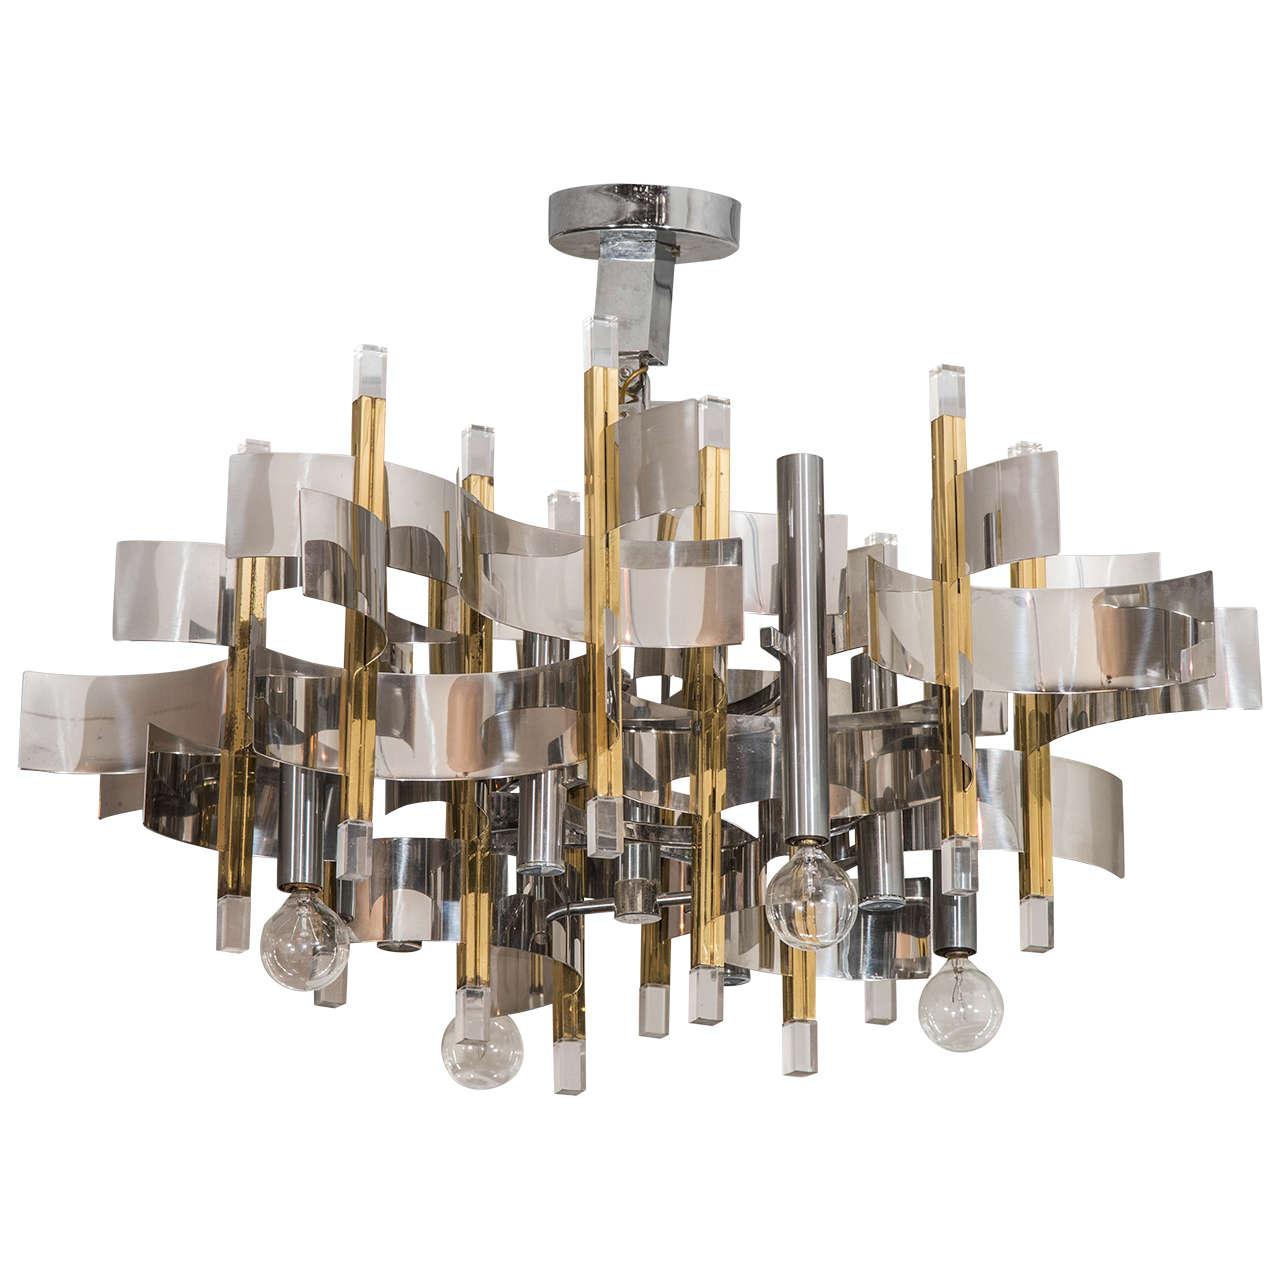 Modern Metal Chandelier: Mid Century Modern Metal and Lucite Chandelier By Gaetano Sciolari 1,Lighting